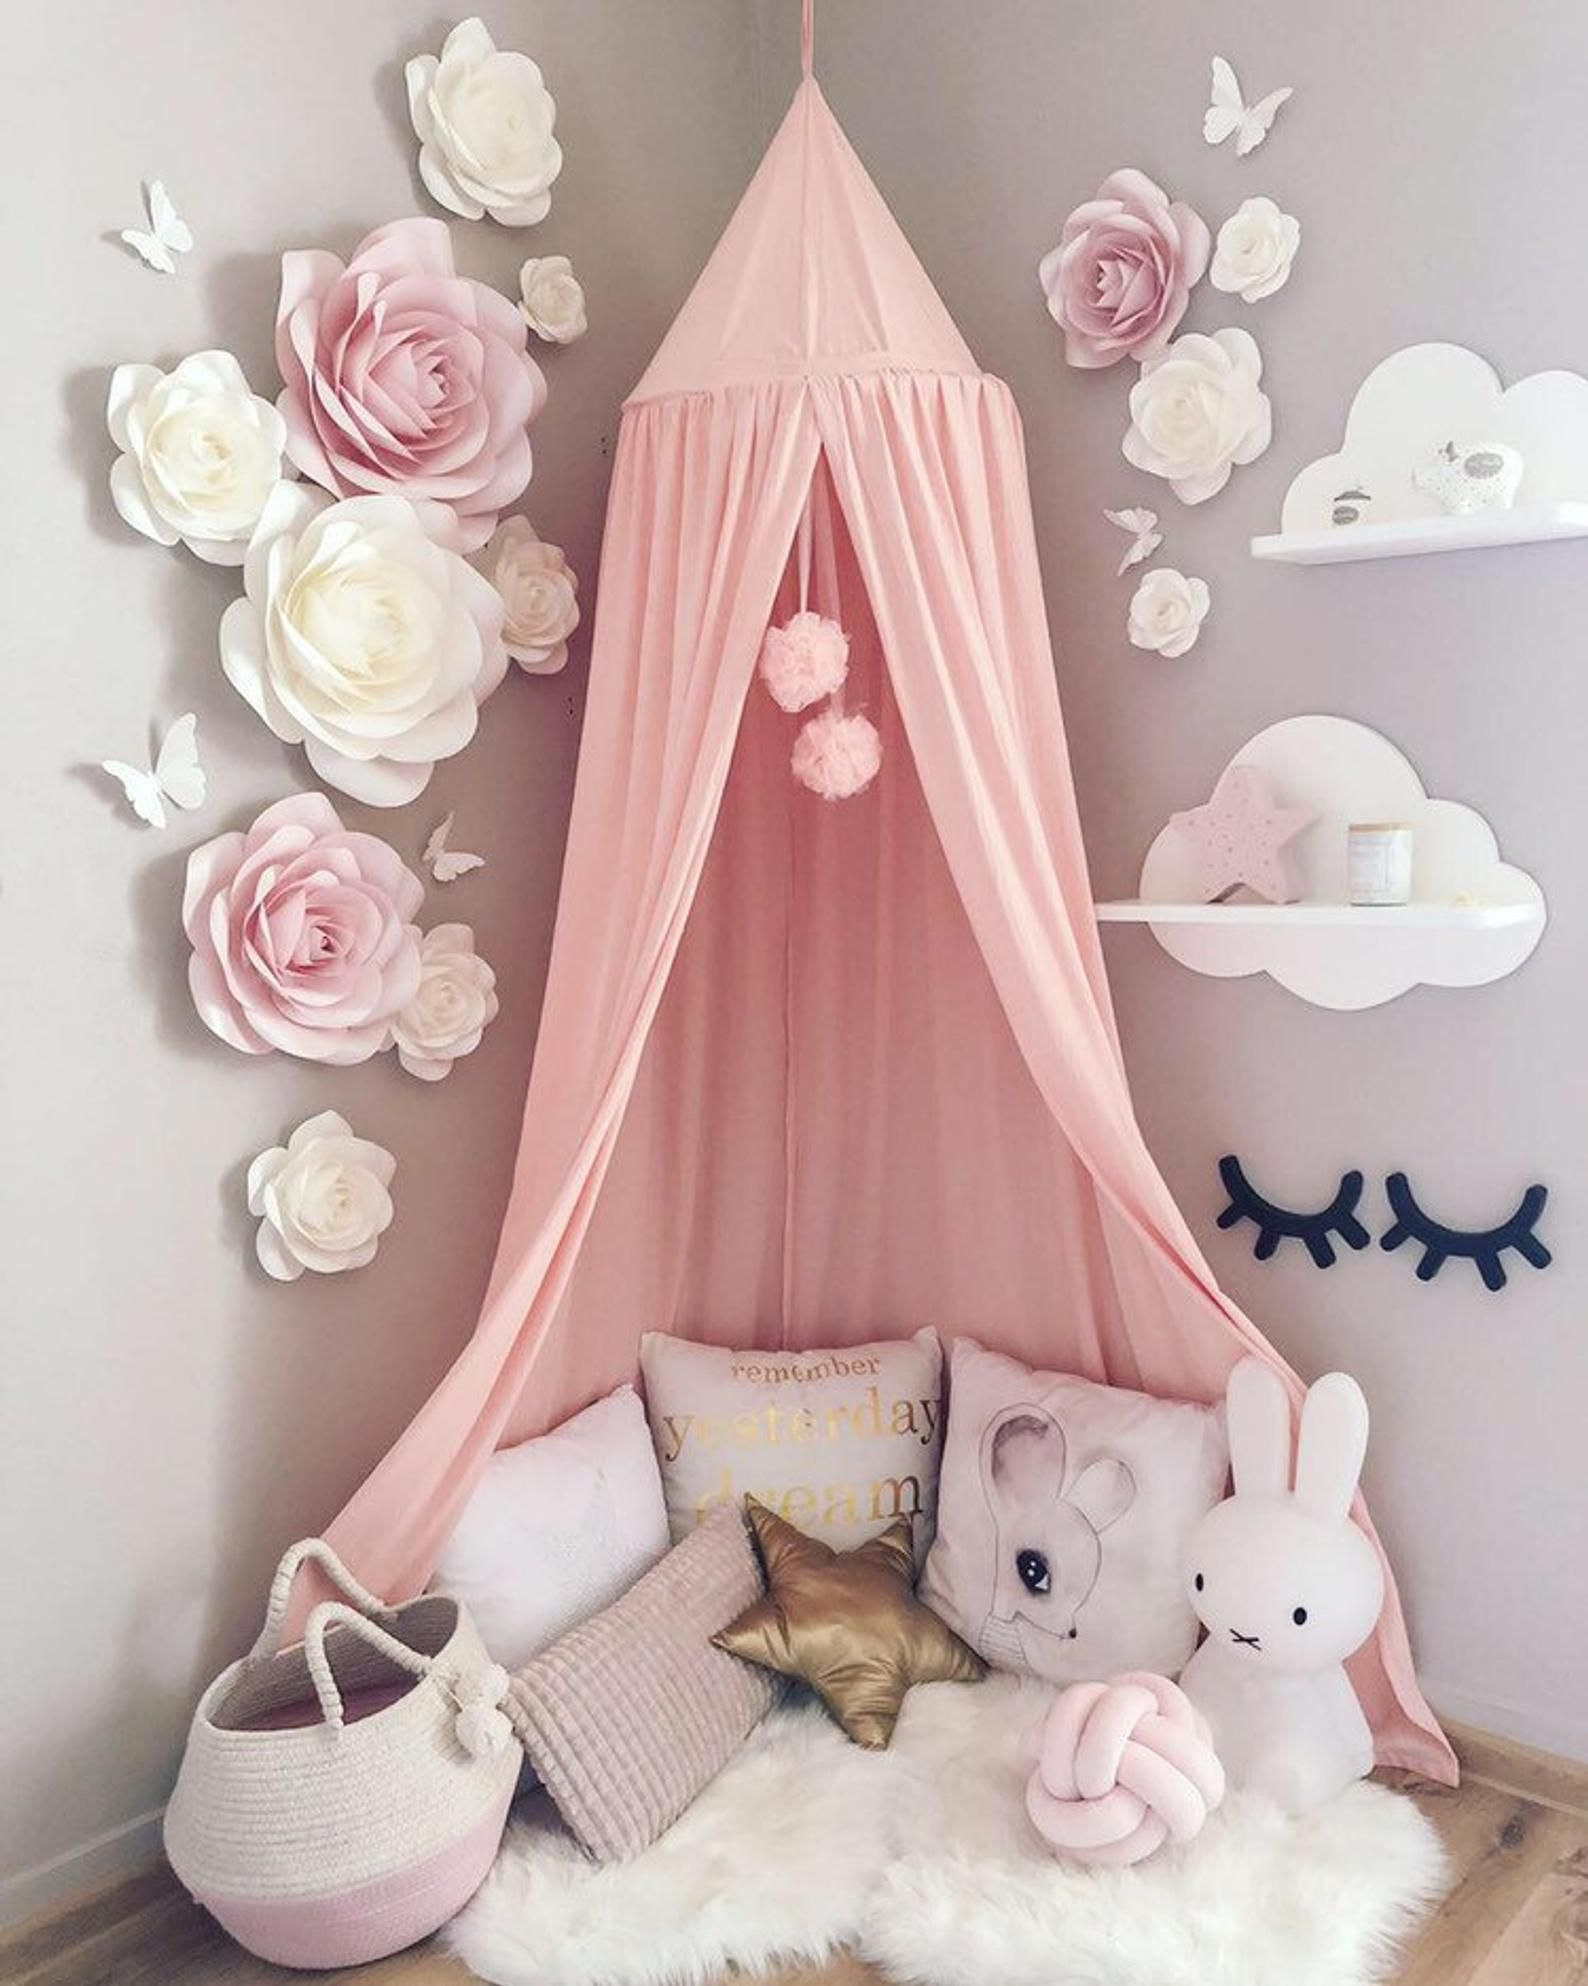 Blush Pink Nursery Paper Flowers Wall Decor - Baby Girl Room Paper Flowers - Nursery Paper Flowers - Paper Flower Decor - Nursery Wall Decor